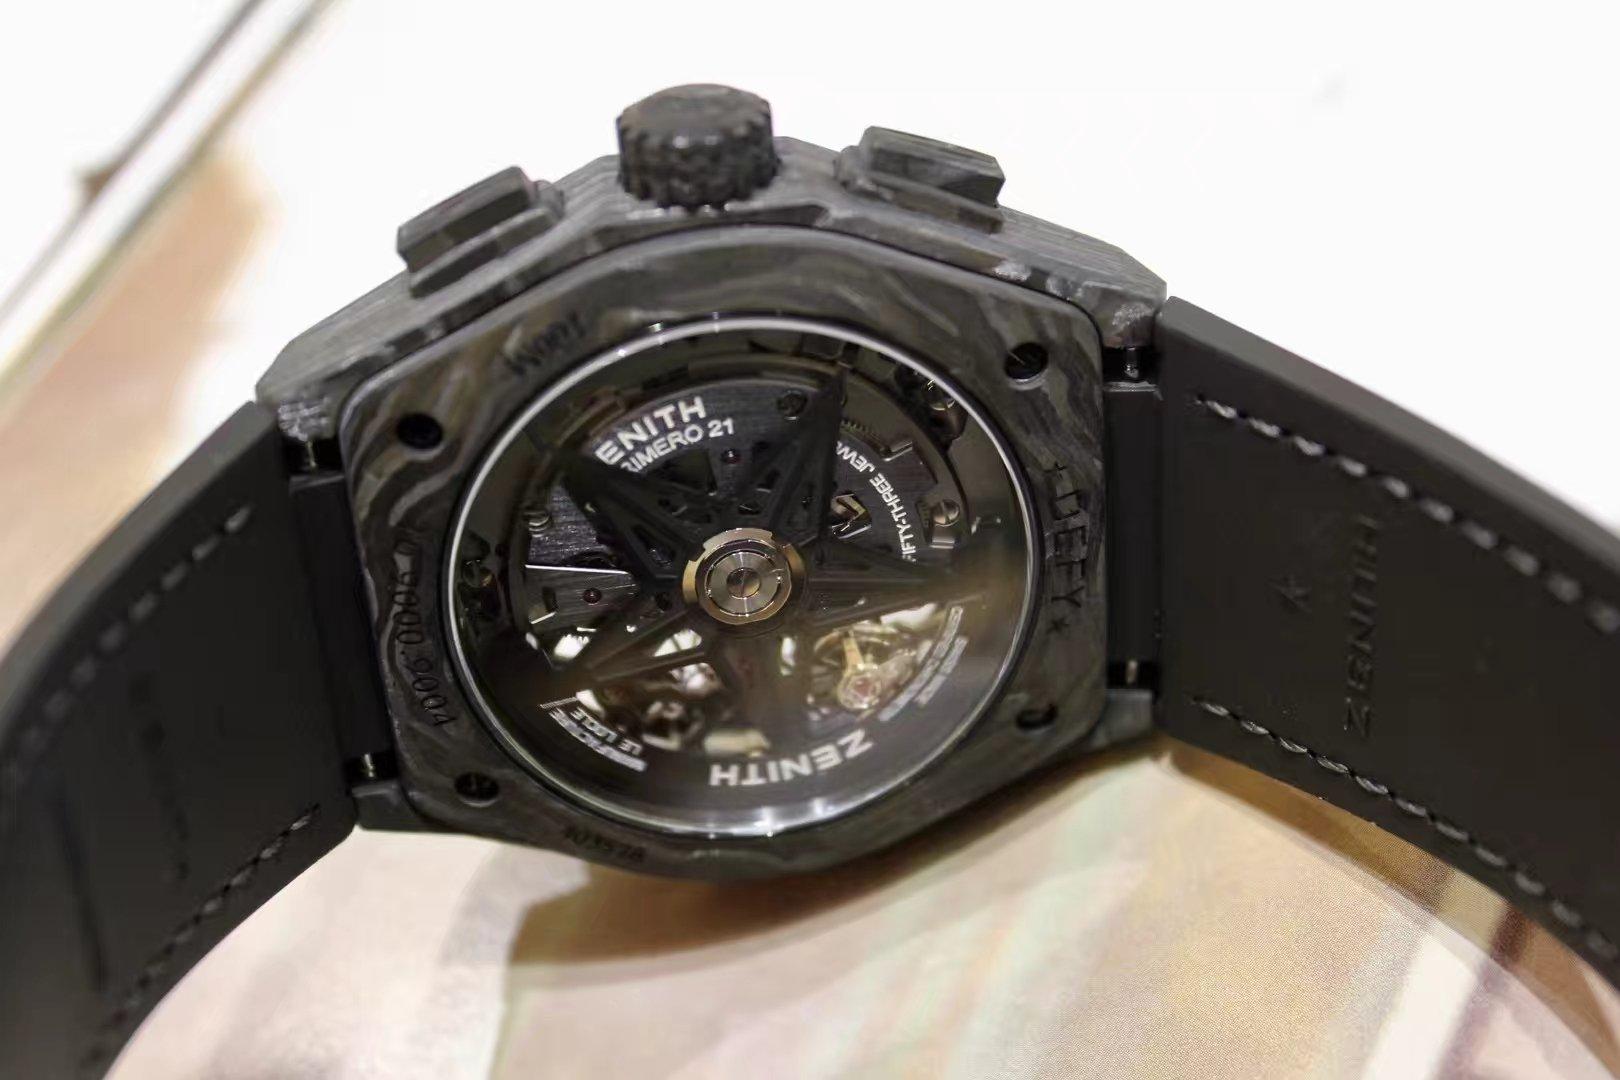 ZENITH真力时DEFY El Primero 21 系列镂空计时腕表,黑碳纤维材质10.9000.9004/96.R921插图2